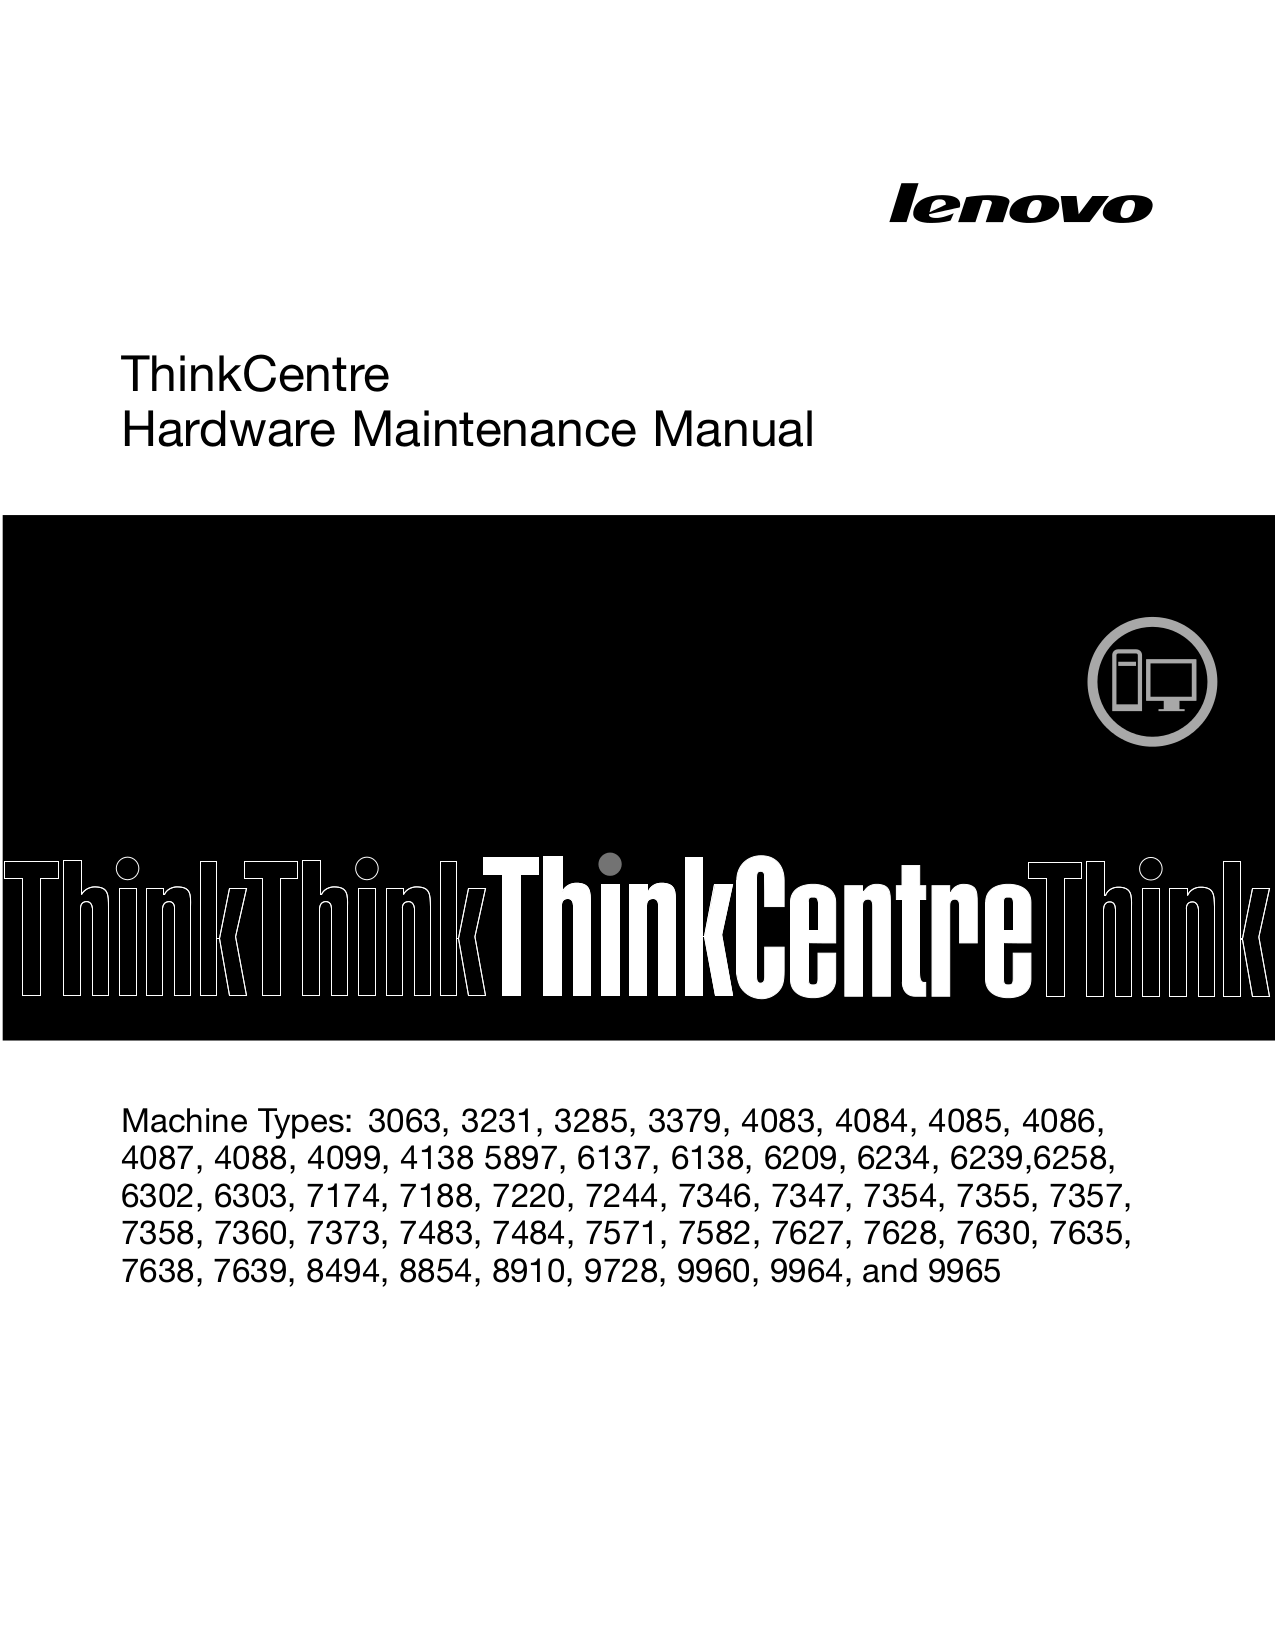 pdf for Lenovo Desktop ThinkCentre M58p 6234 manual